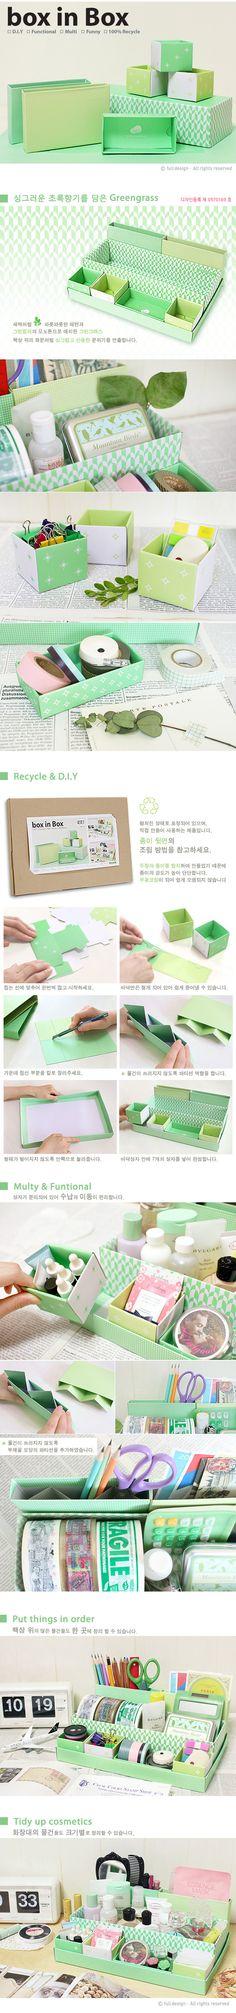 Multi Use Ordering Box Full Design Box in Box